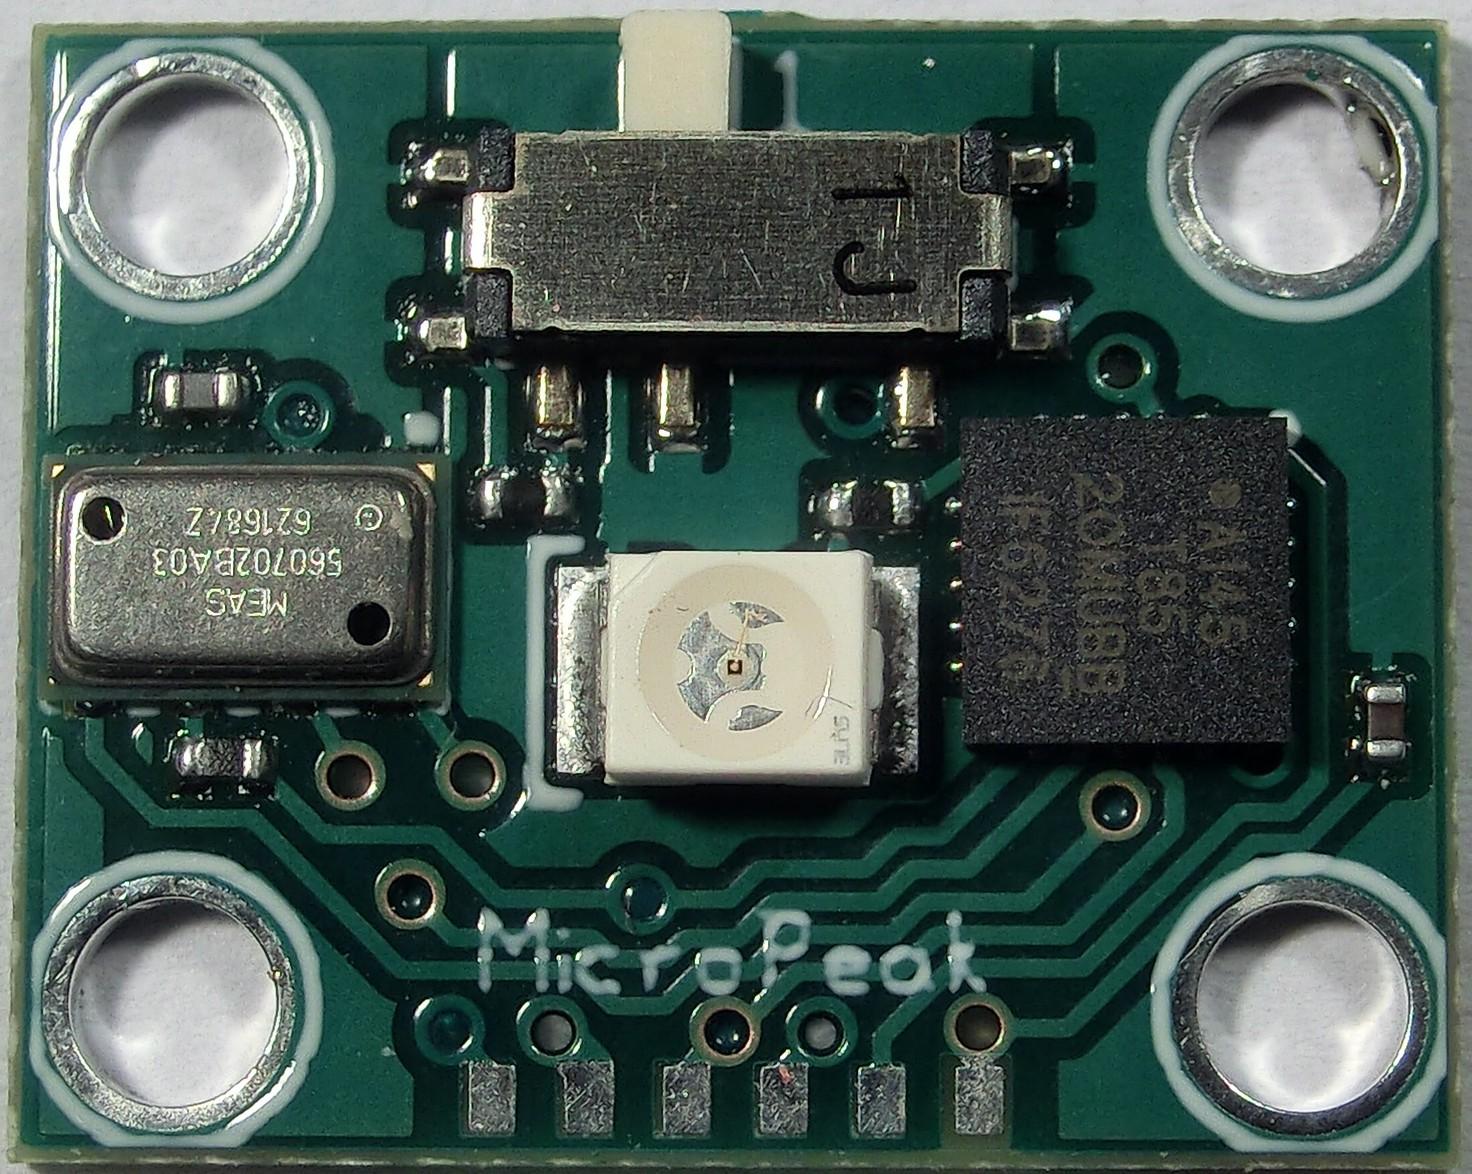 MicroSplash